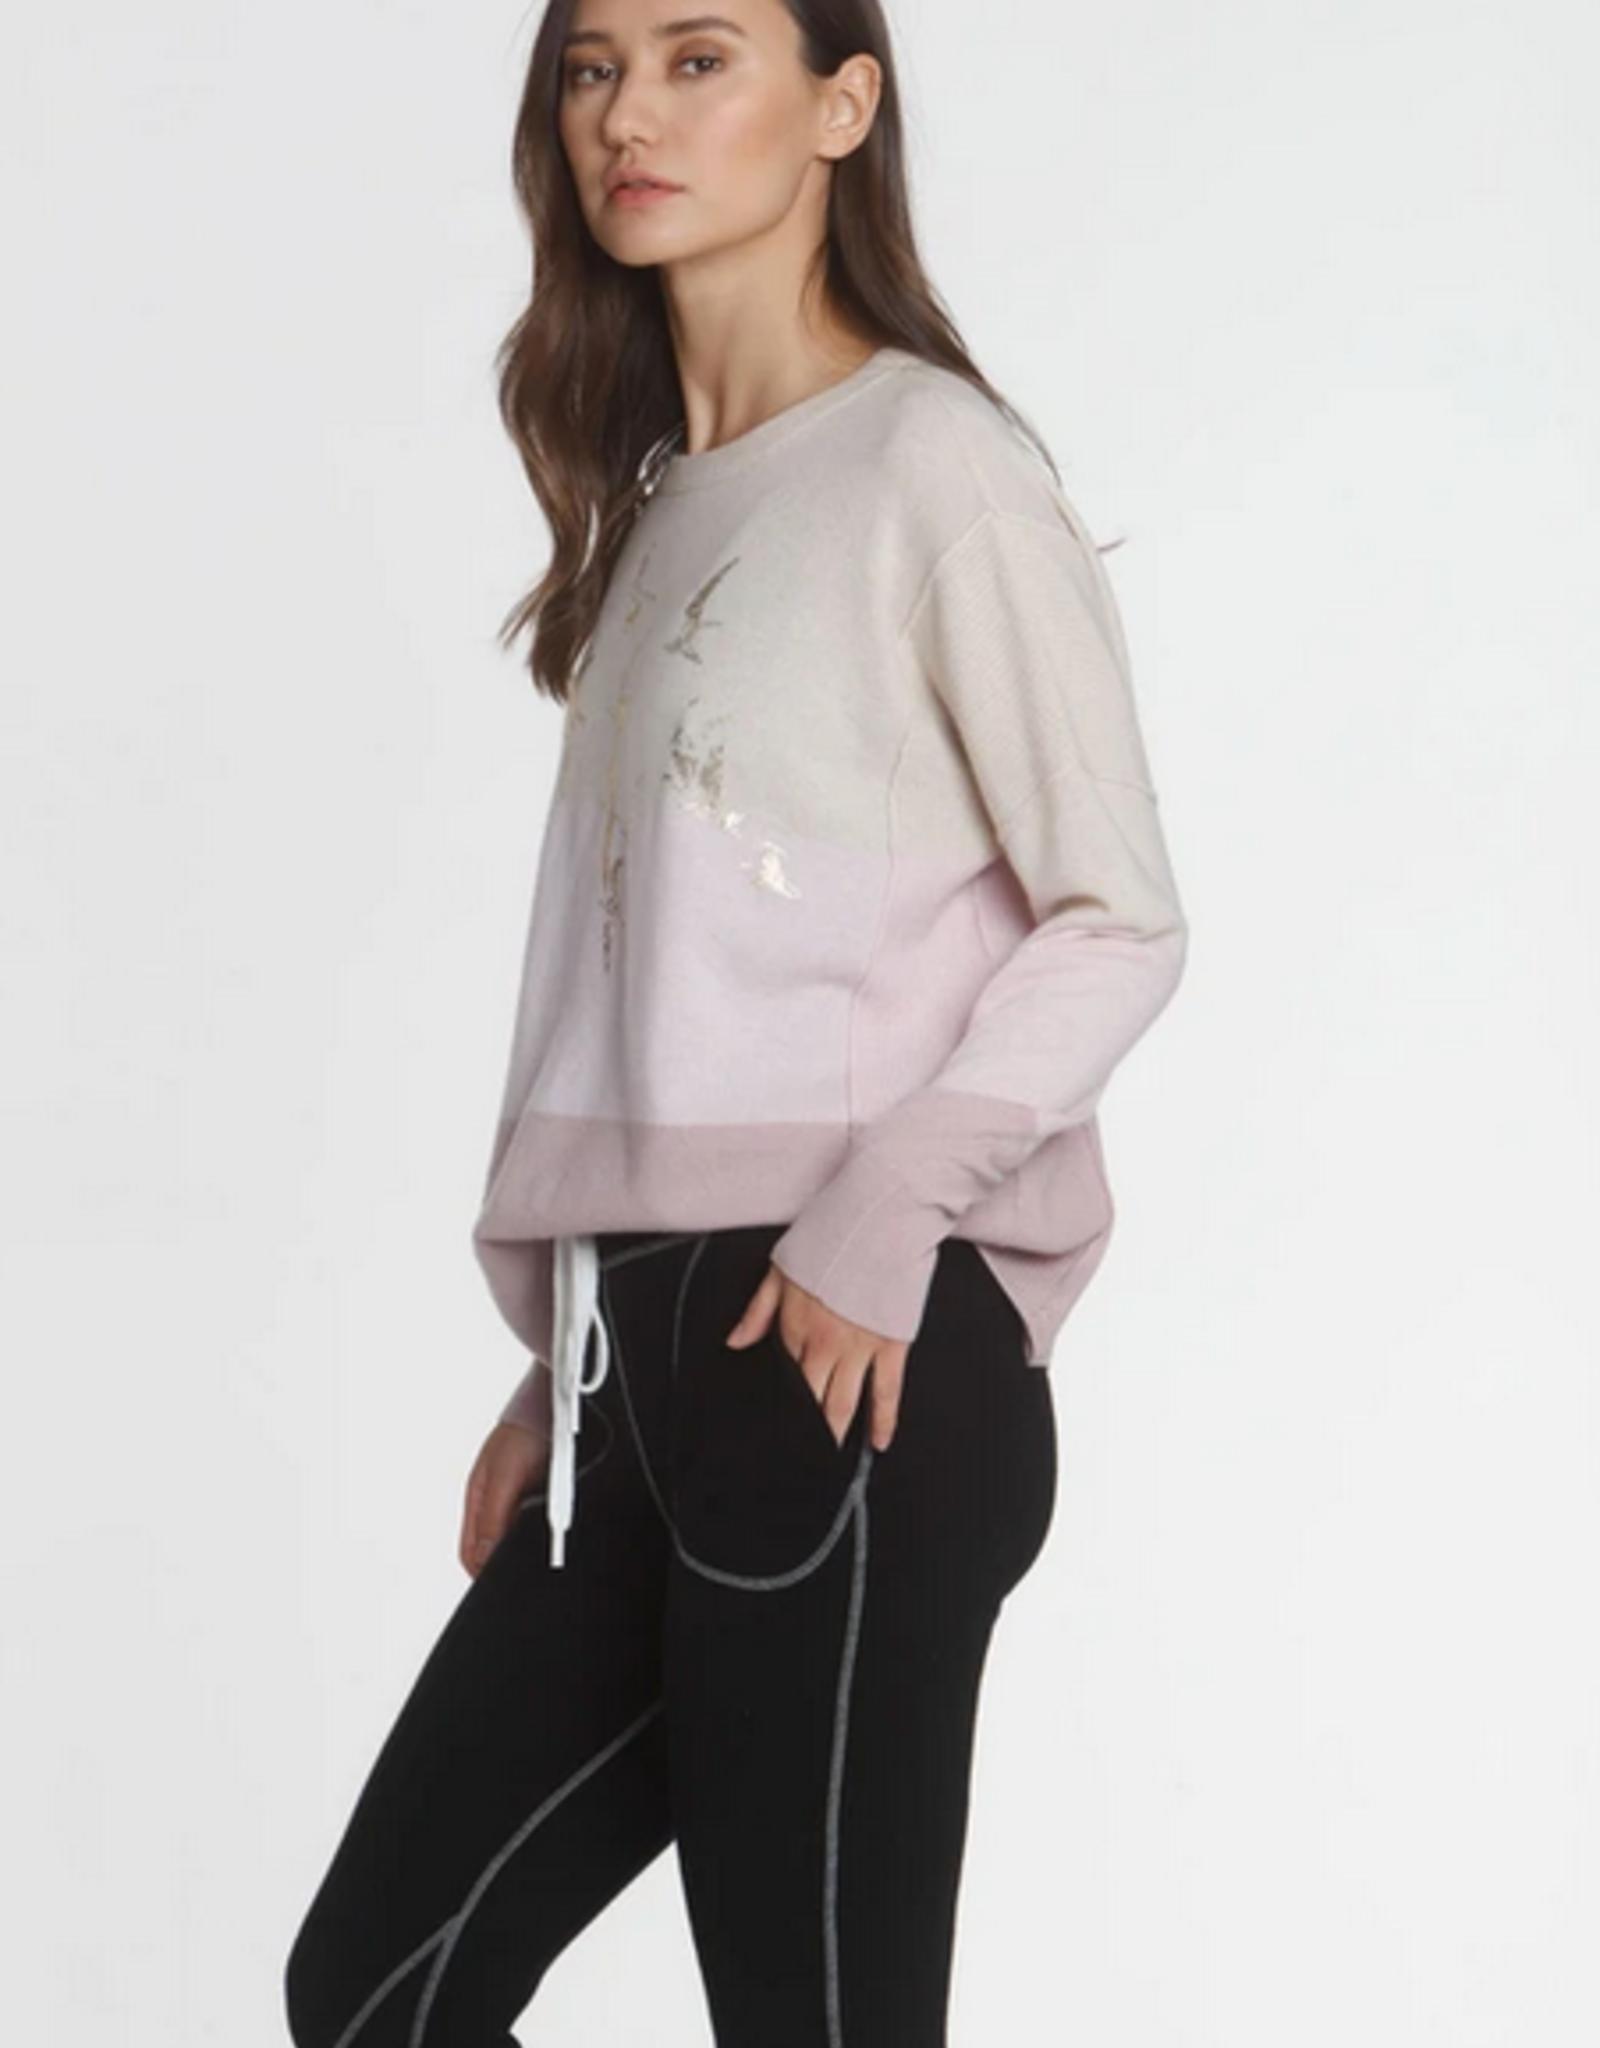 LABEL+thread Sunset Wide Scoop Sweater